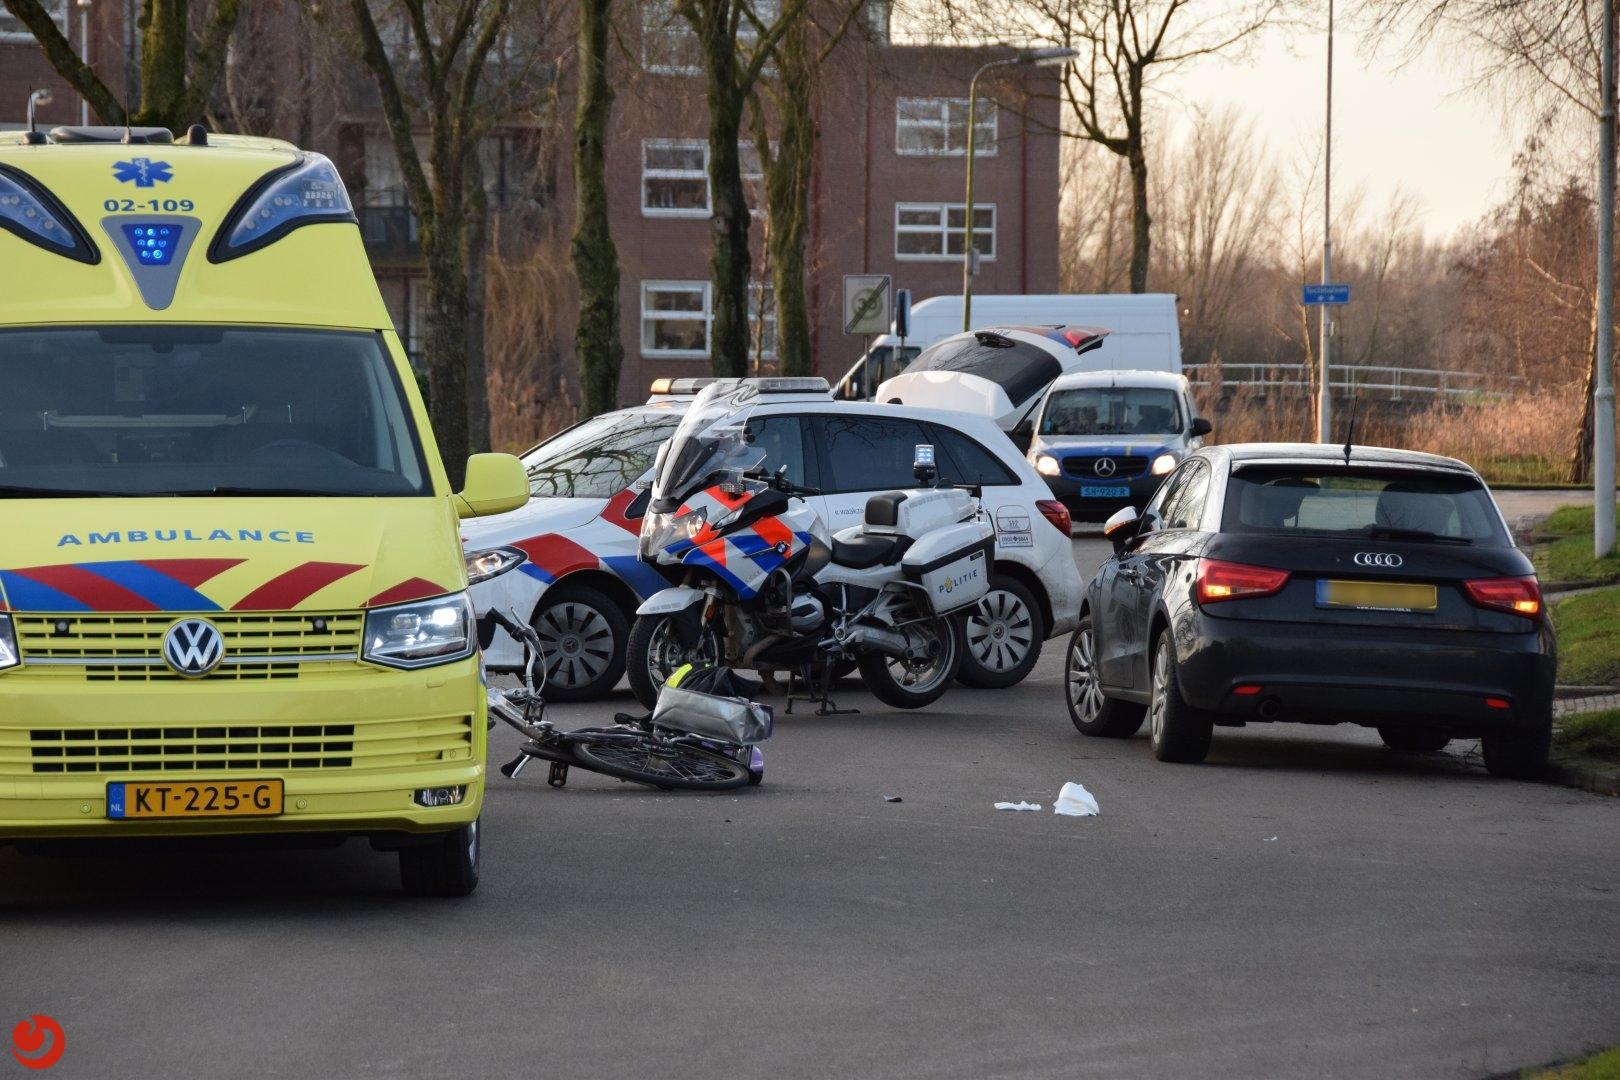 Fietsster gewond na botsing met auto in Kollum